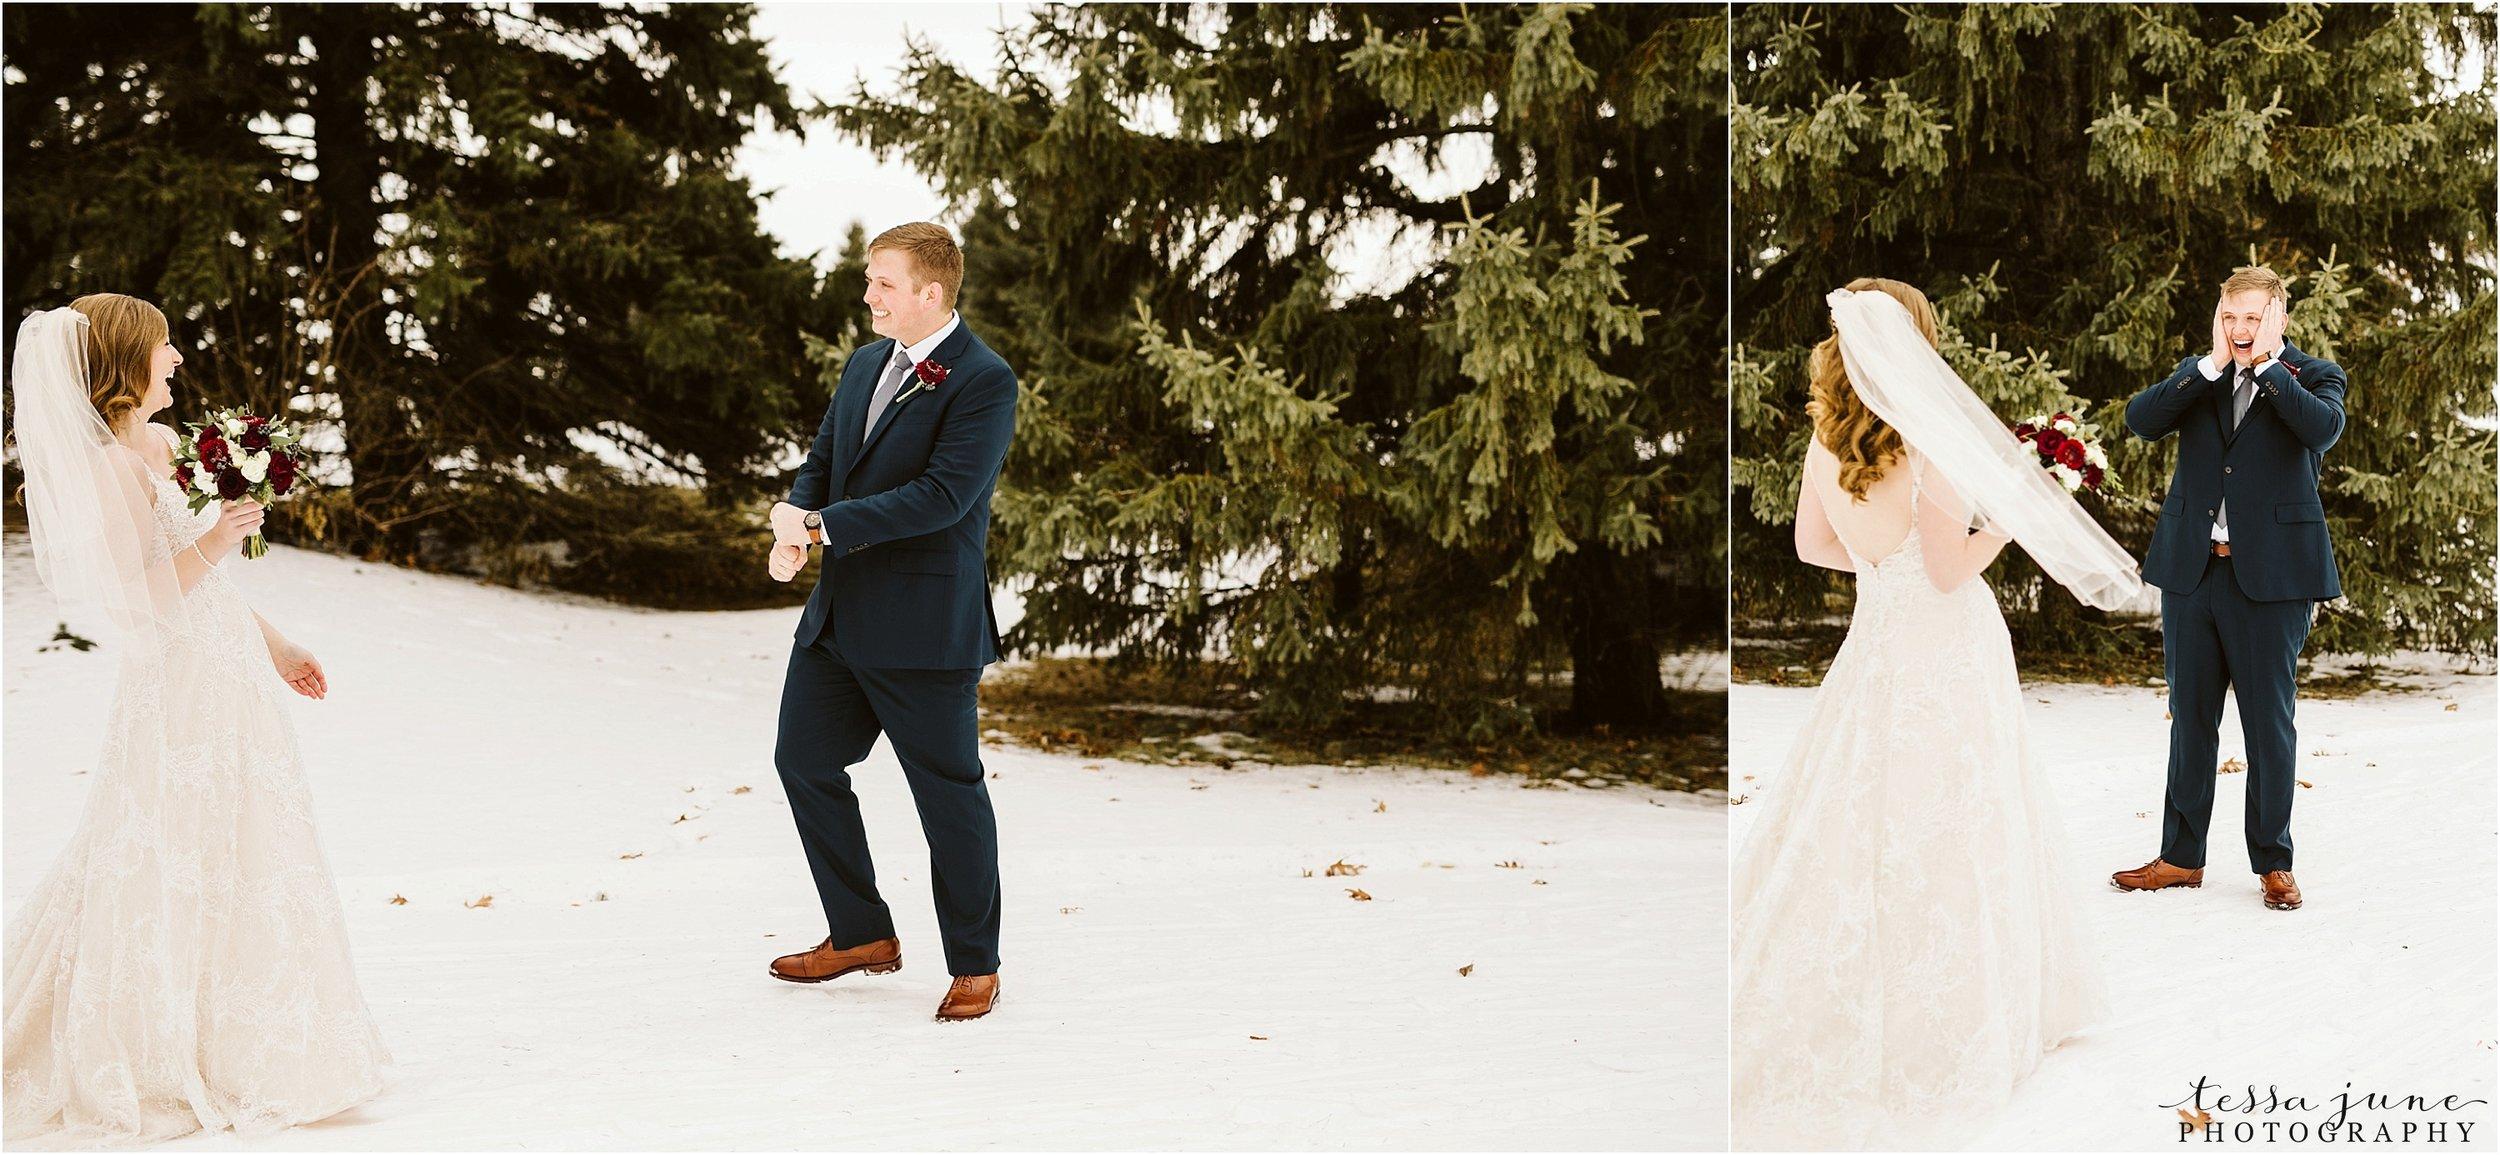 winter-wedding-in-eden-prairie-barn-minnesota-airplane-71.jpg